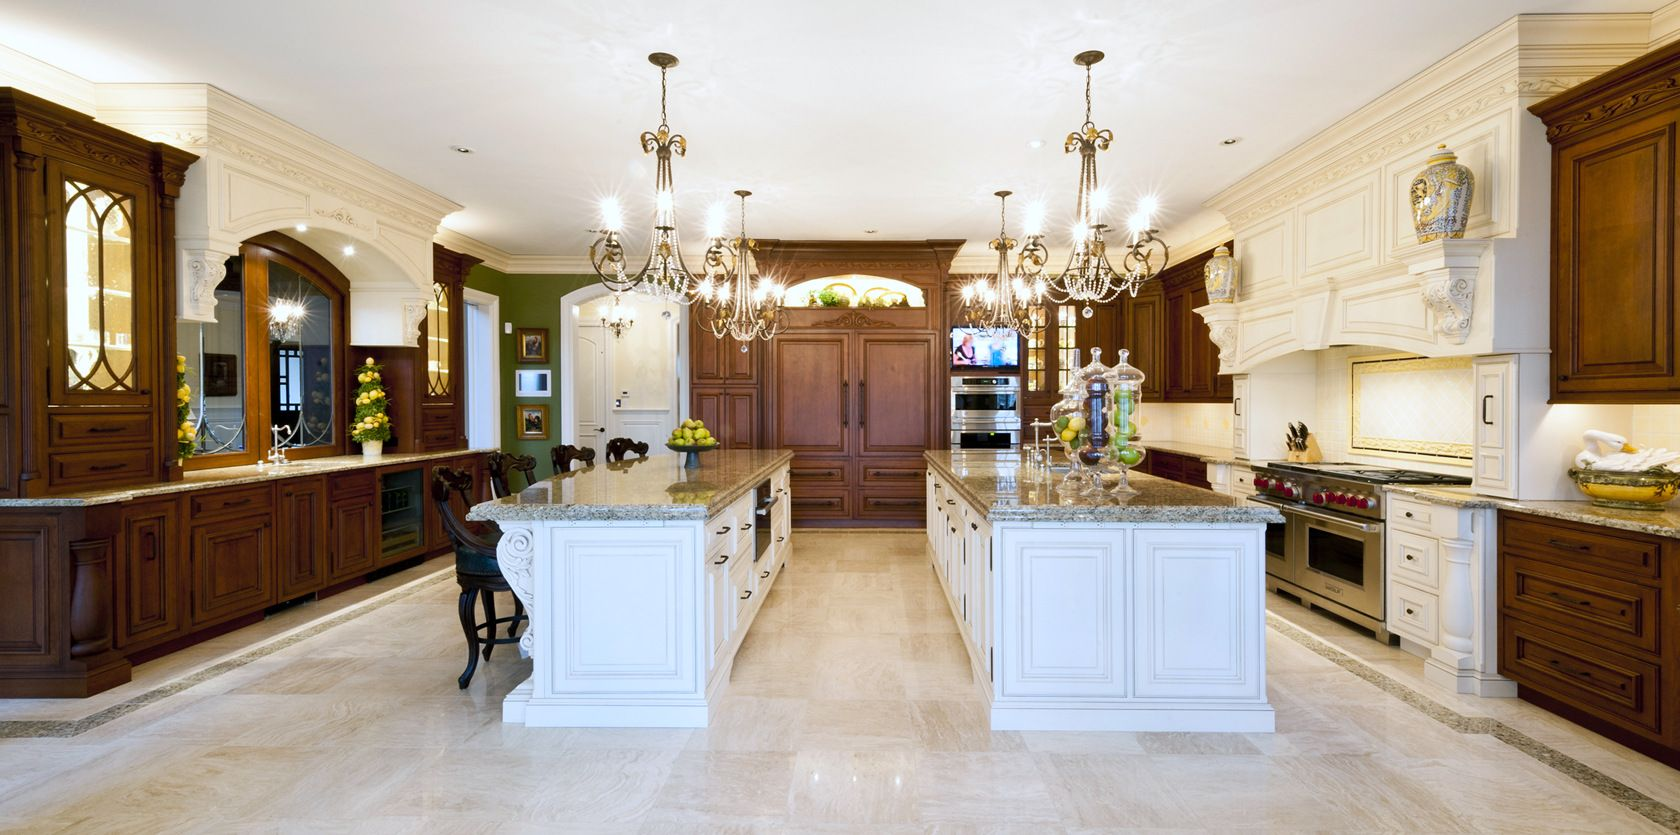 custom double island kitchen design by cvl designs, ocean city, nj